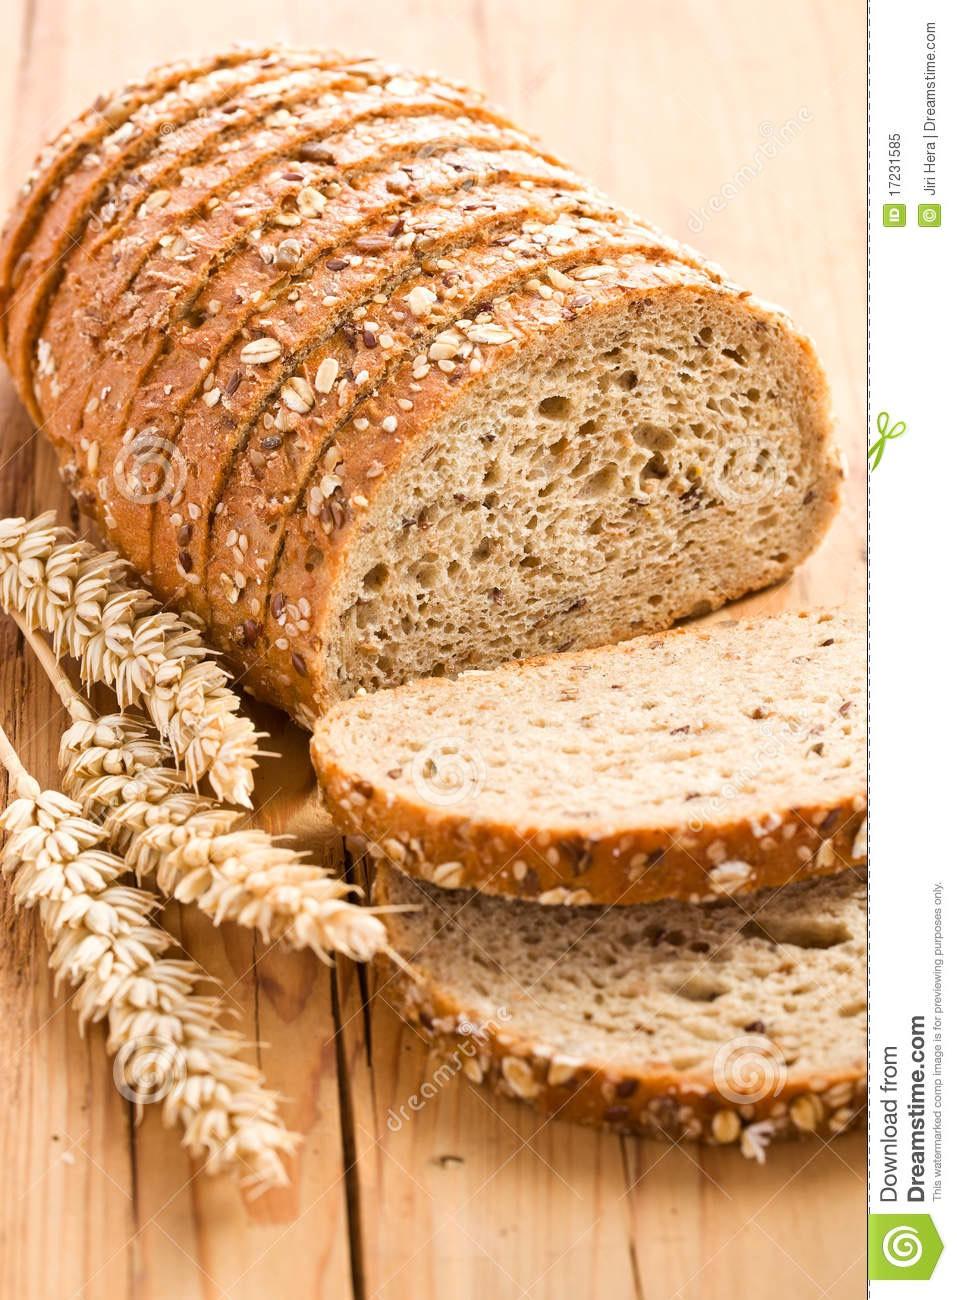 6) whole wheat bread